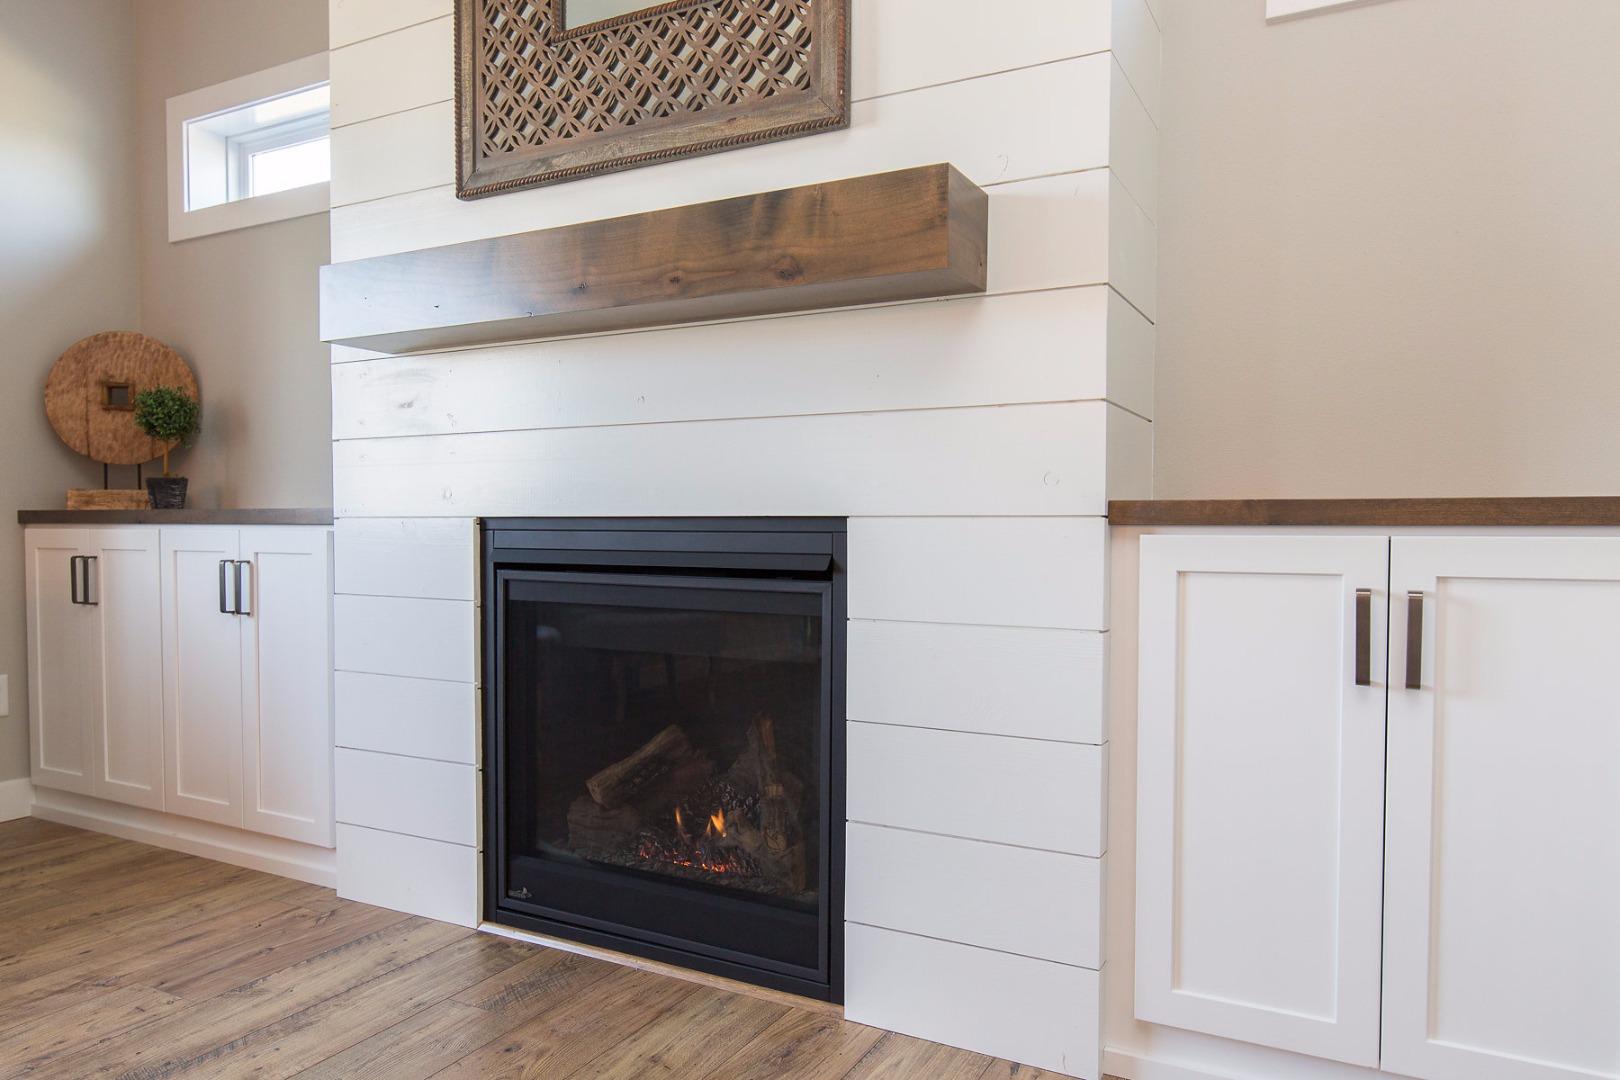 Fireplace Details Materials Surrounds Krueger Construction Custom Home Builder In Fargo West Fargo Nd